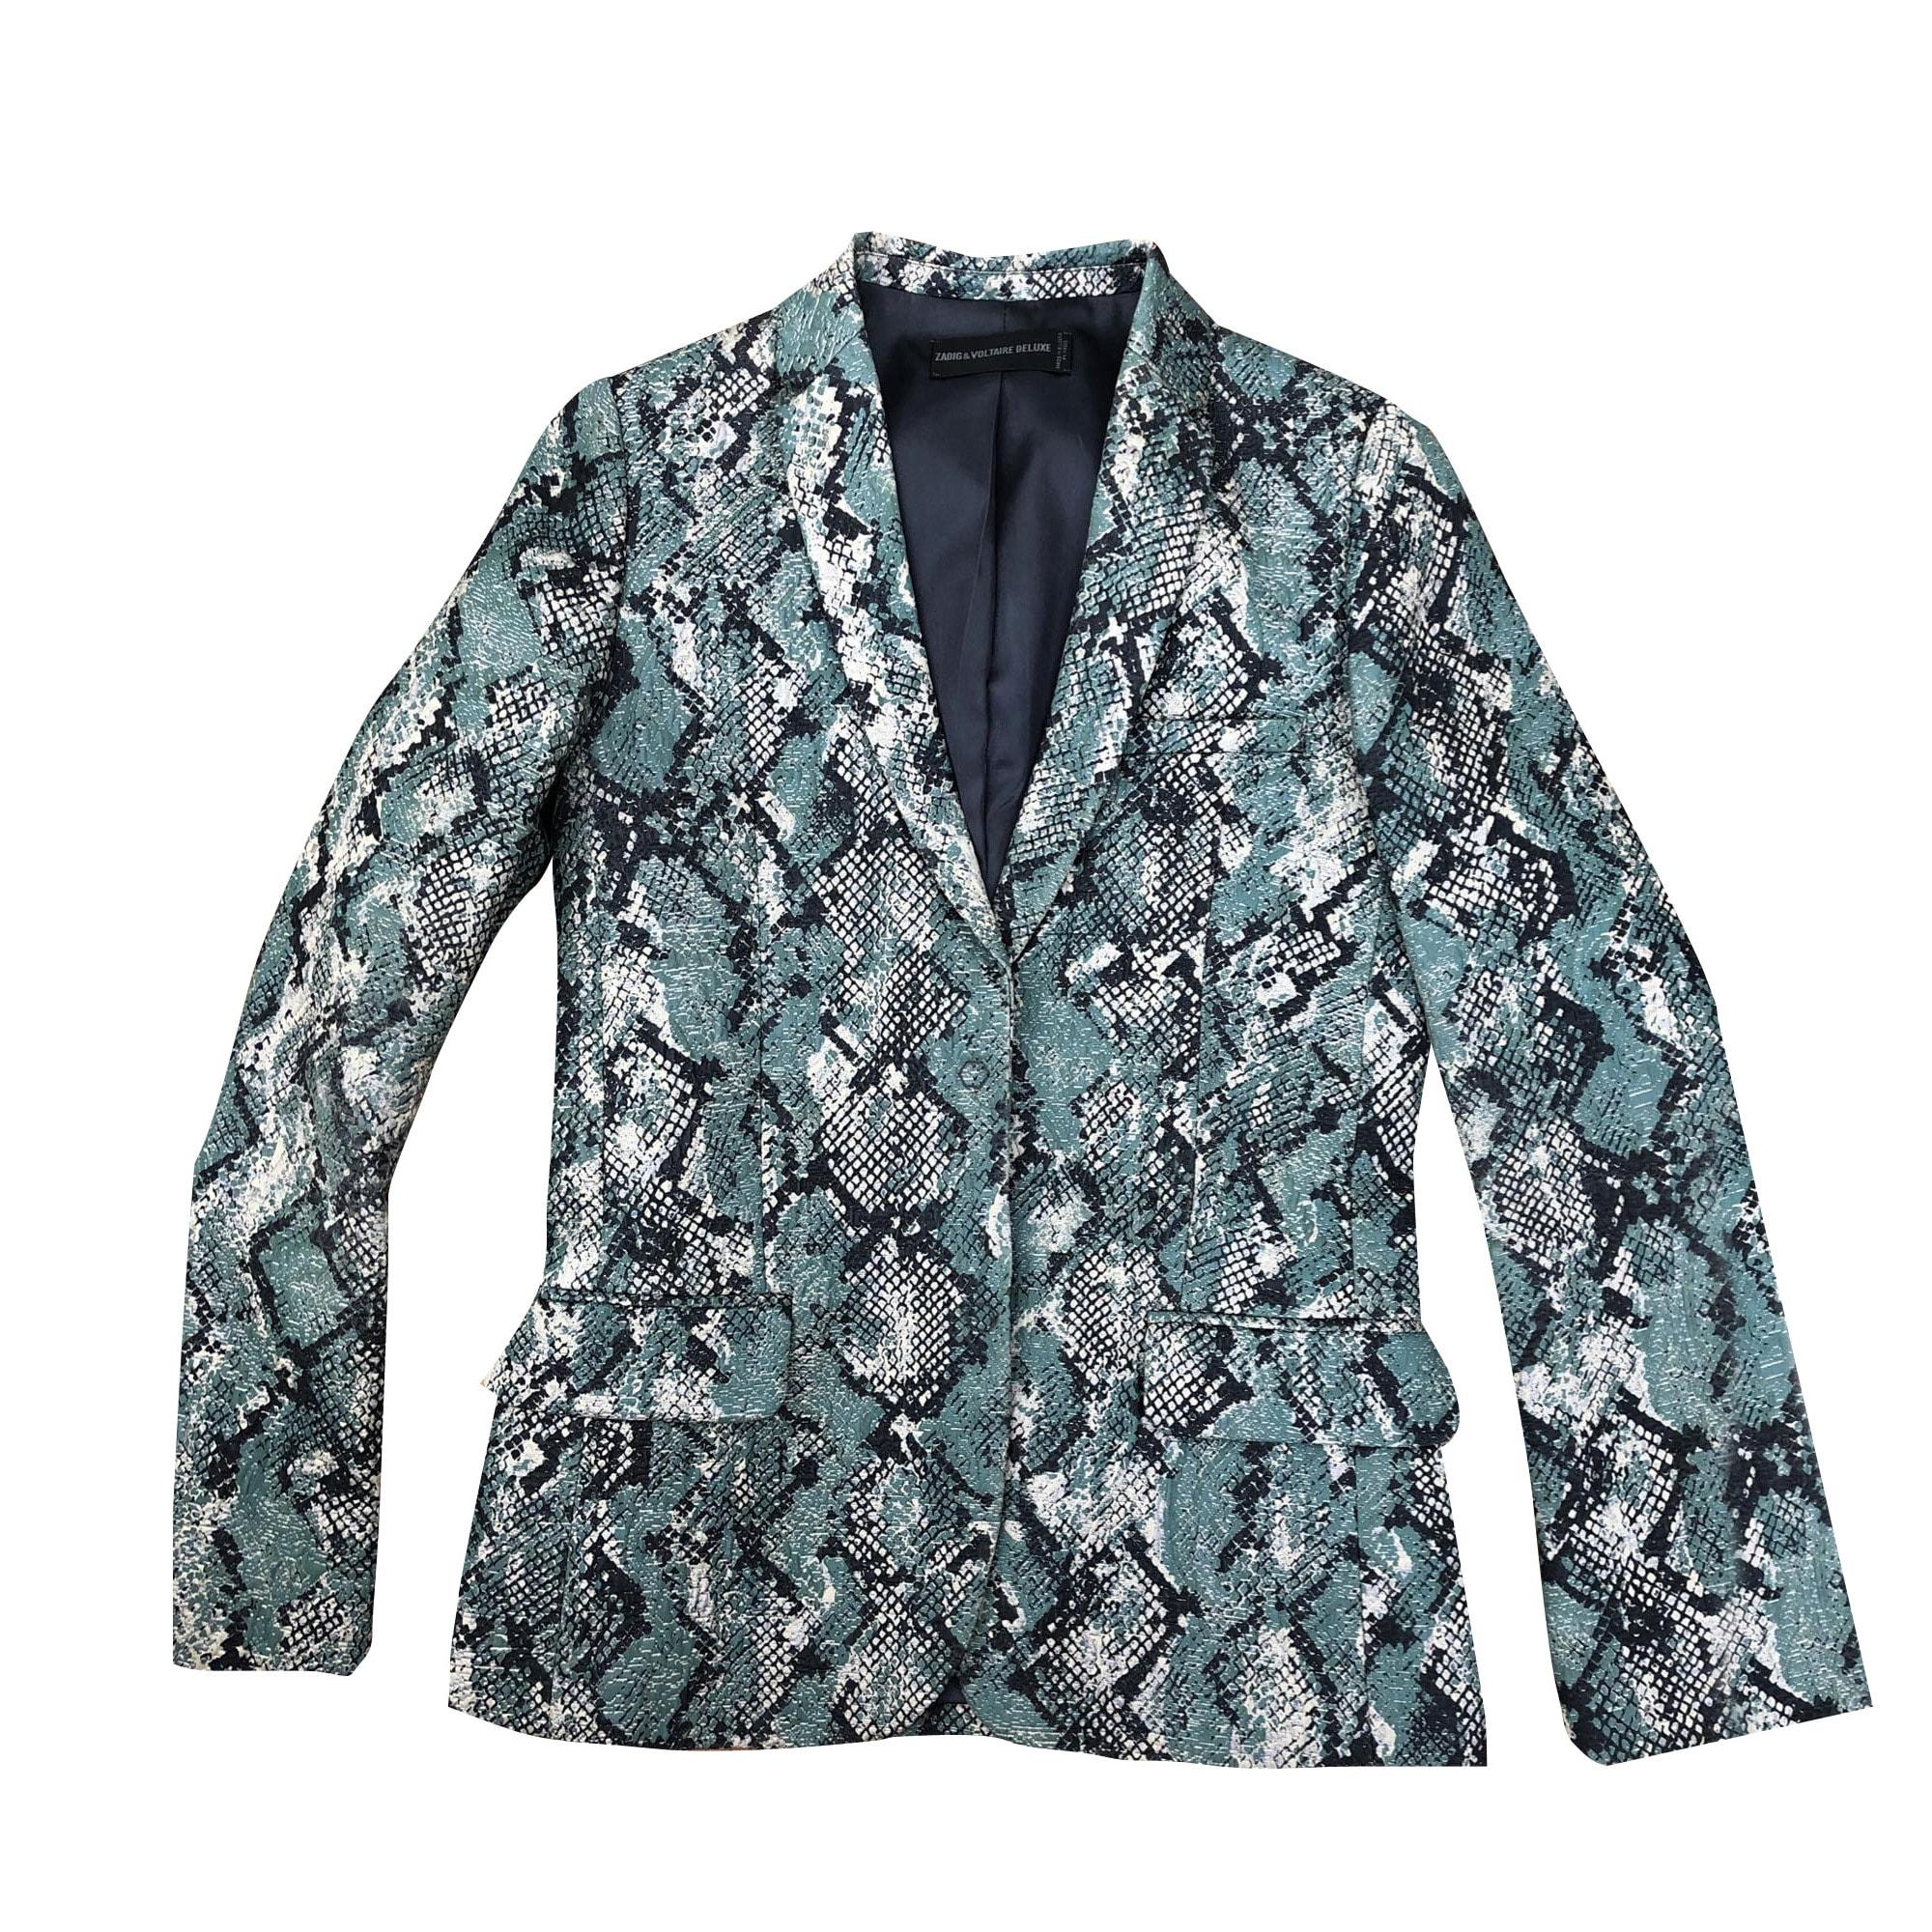 Blazer, veste tailleur ZADIG & VOLTAIRE Imprimés animaliers